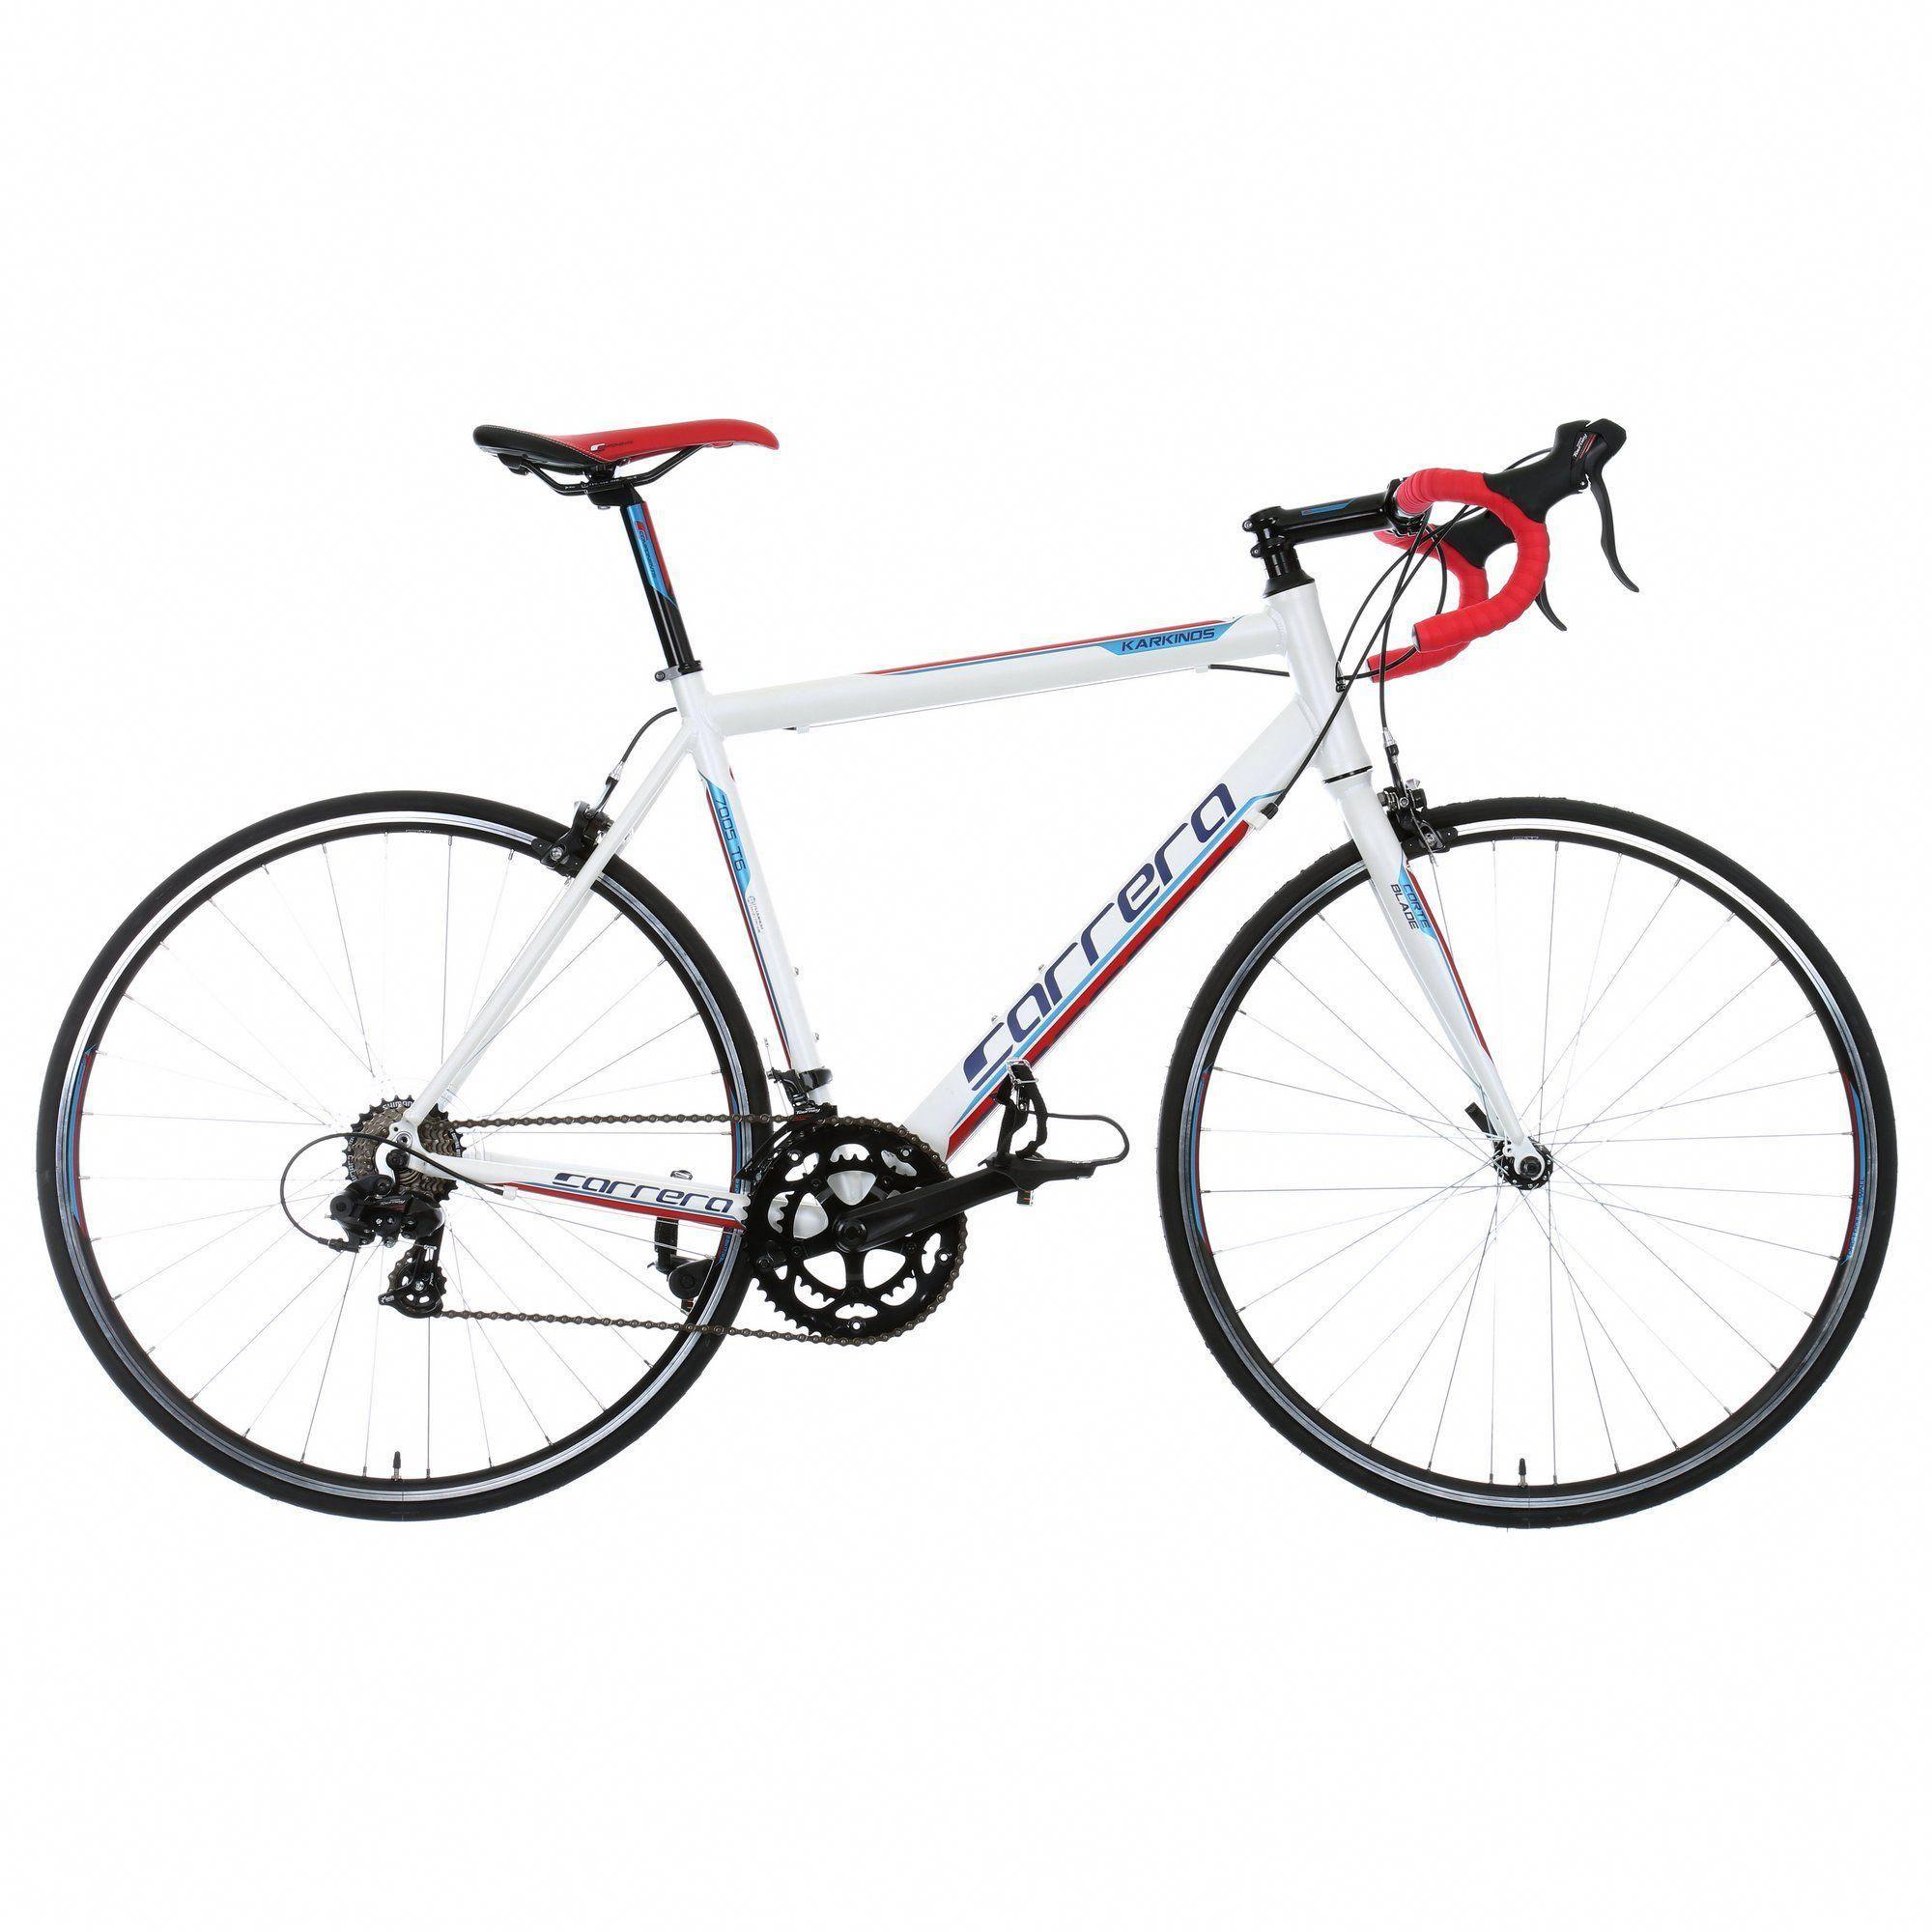 Types Of Bikes Road Racing Bike Bike Racing Bikes